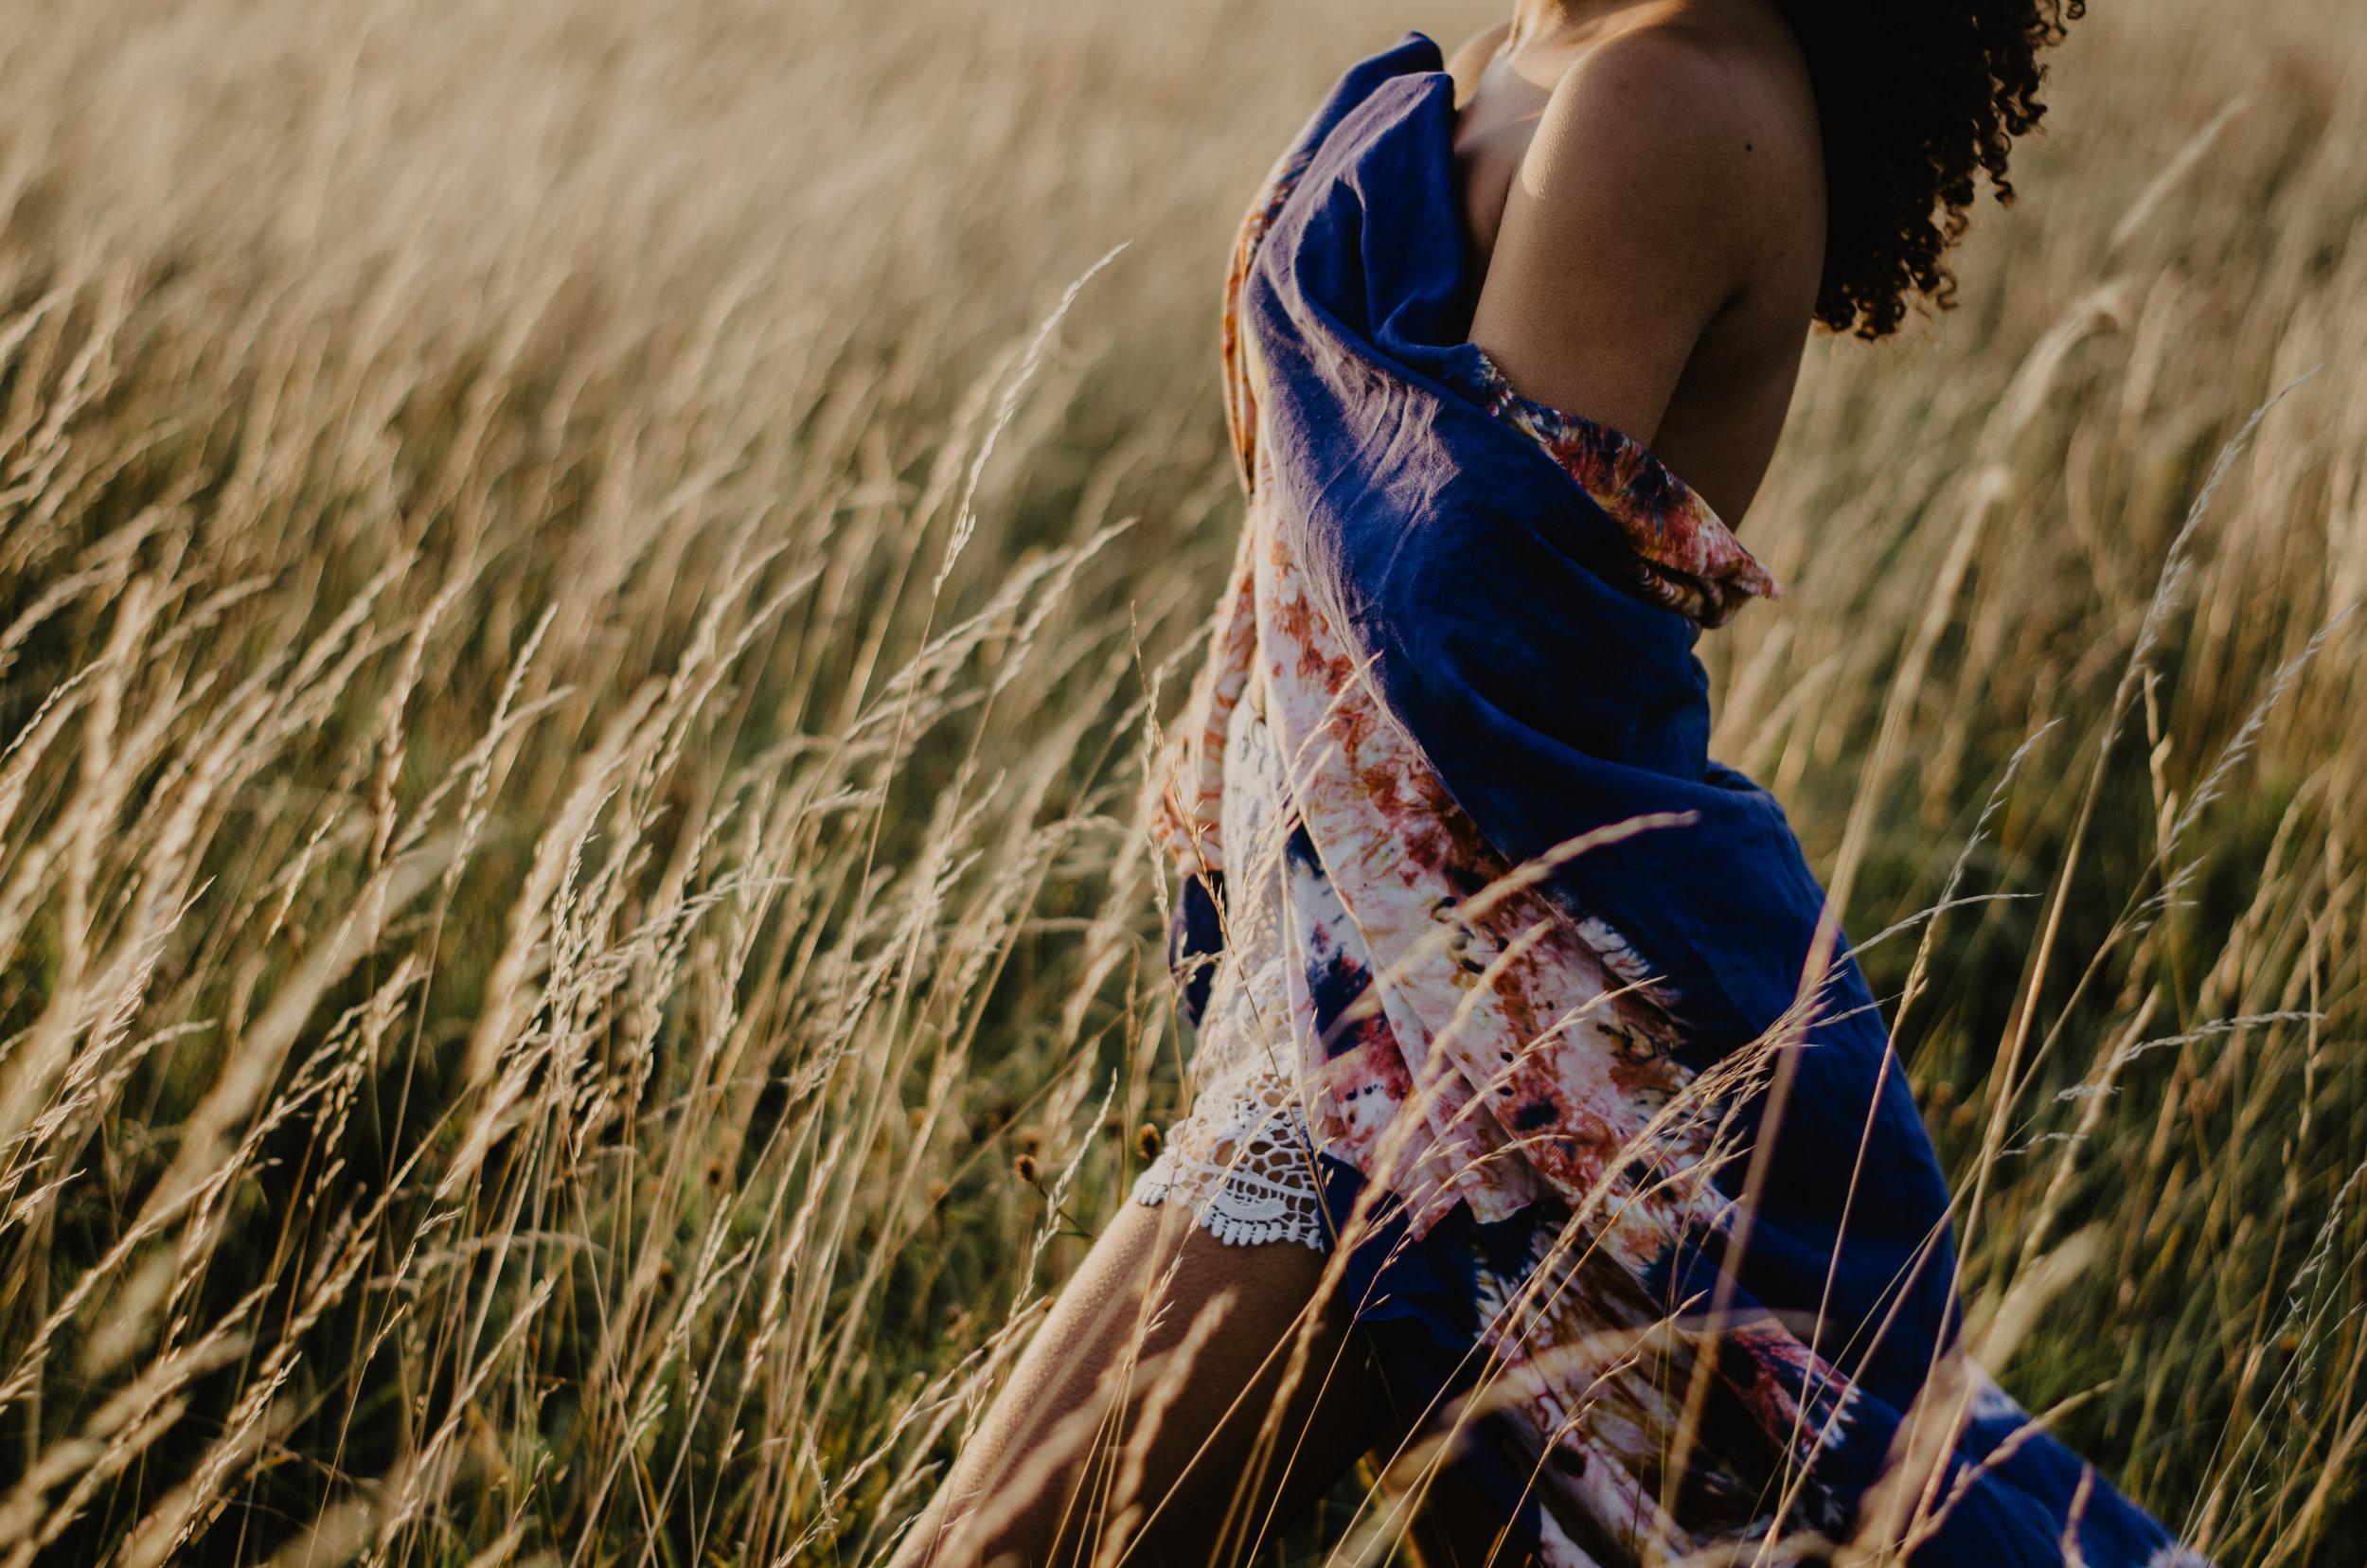 Inka-Portrait-Session-Aiste-Saulyte-Photography-17-07-30-483.jpg